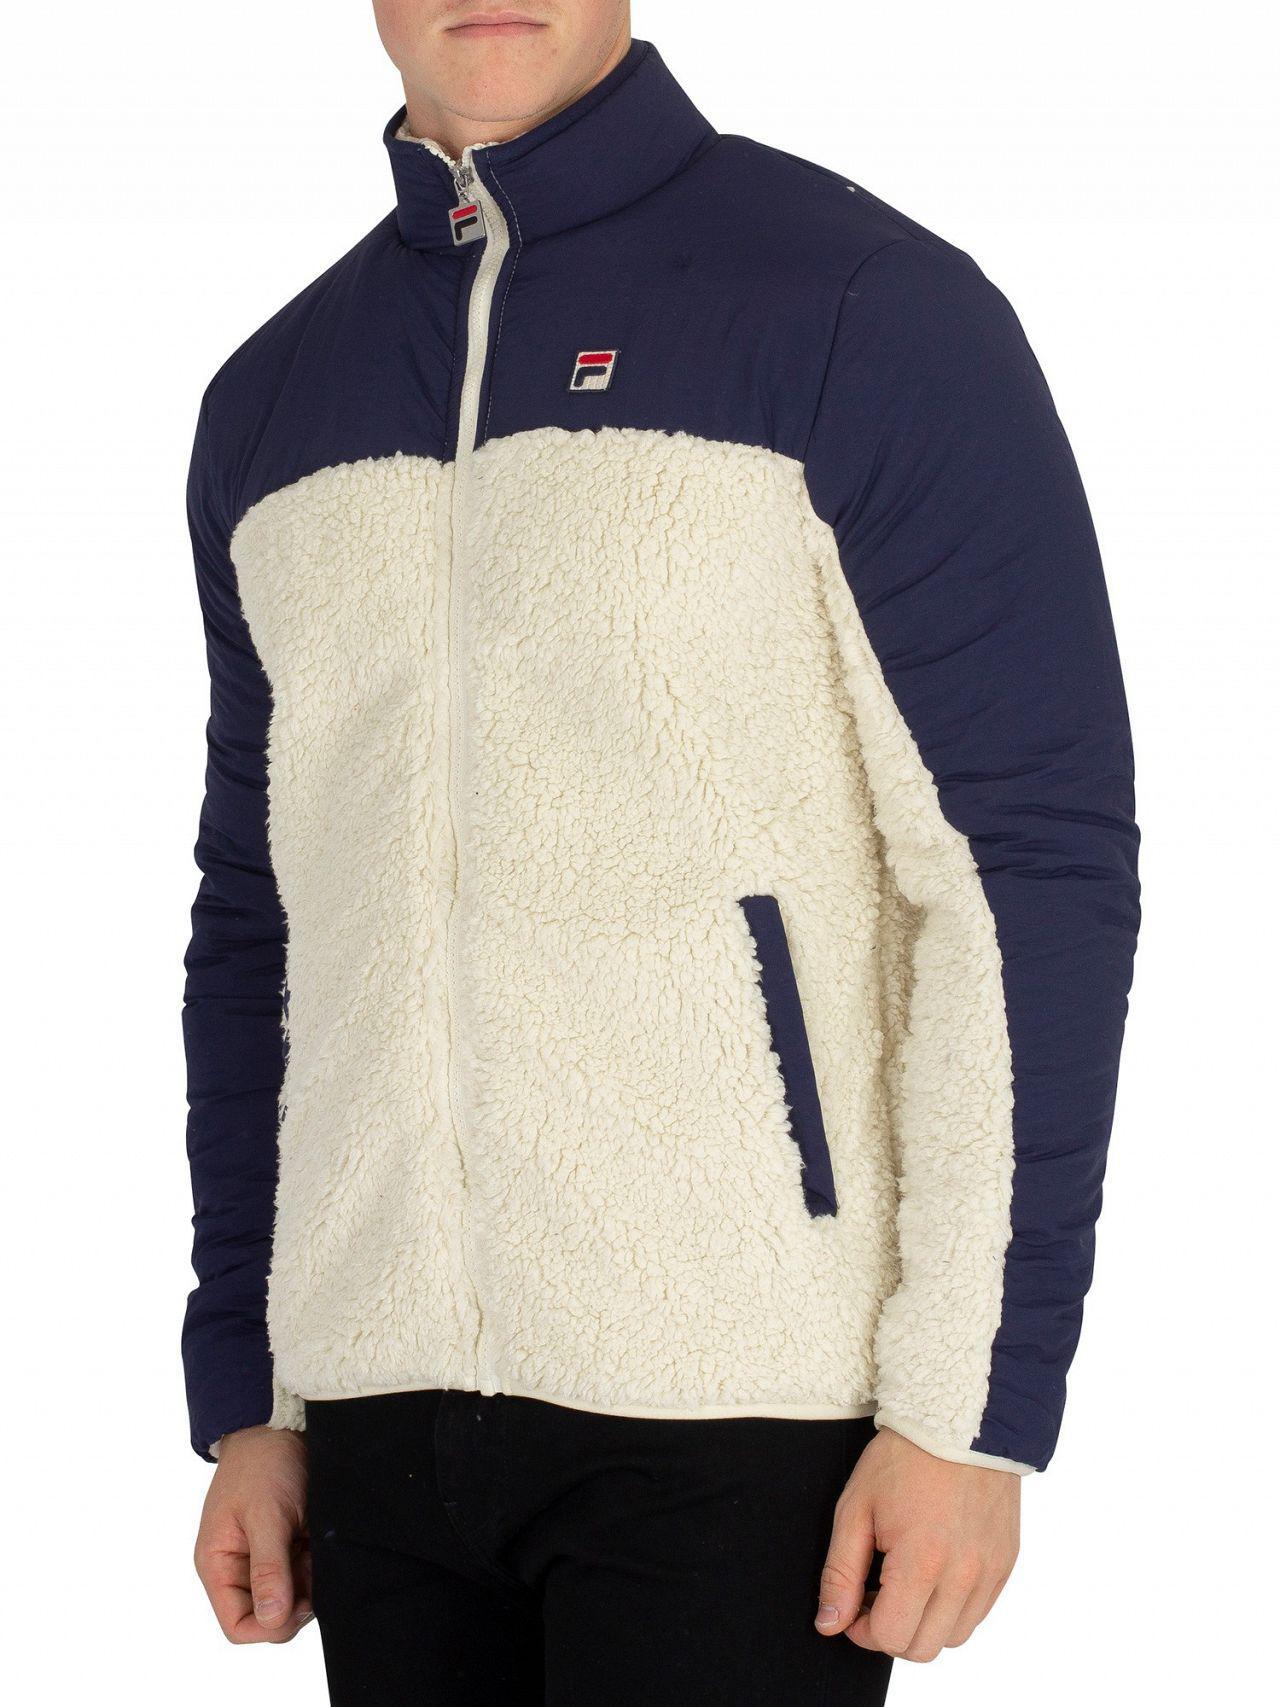 buy \u003e fila fleece jacket men's, Up to